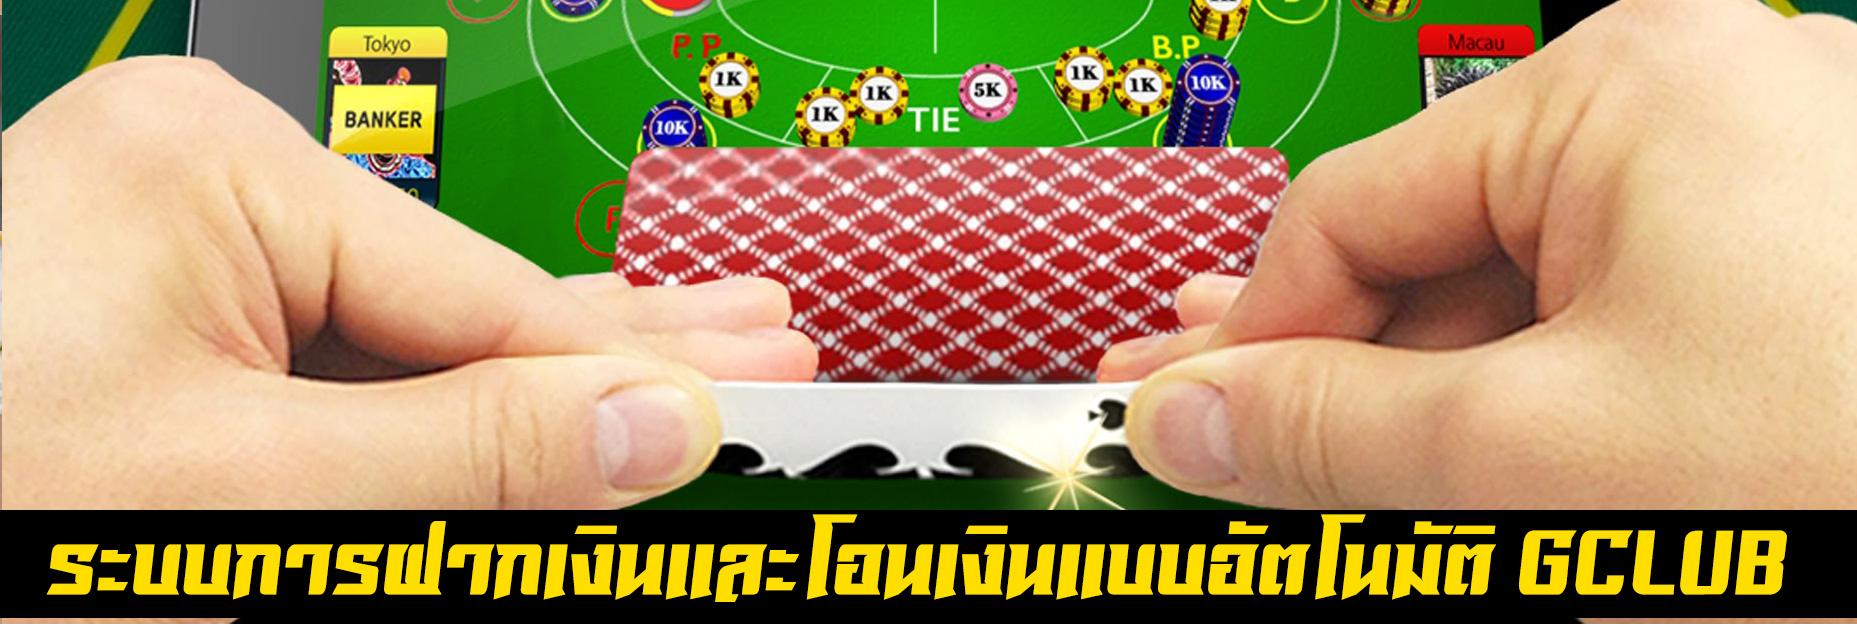 bank-casino